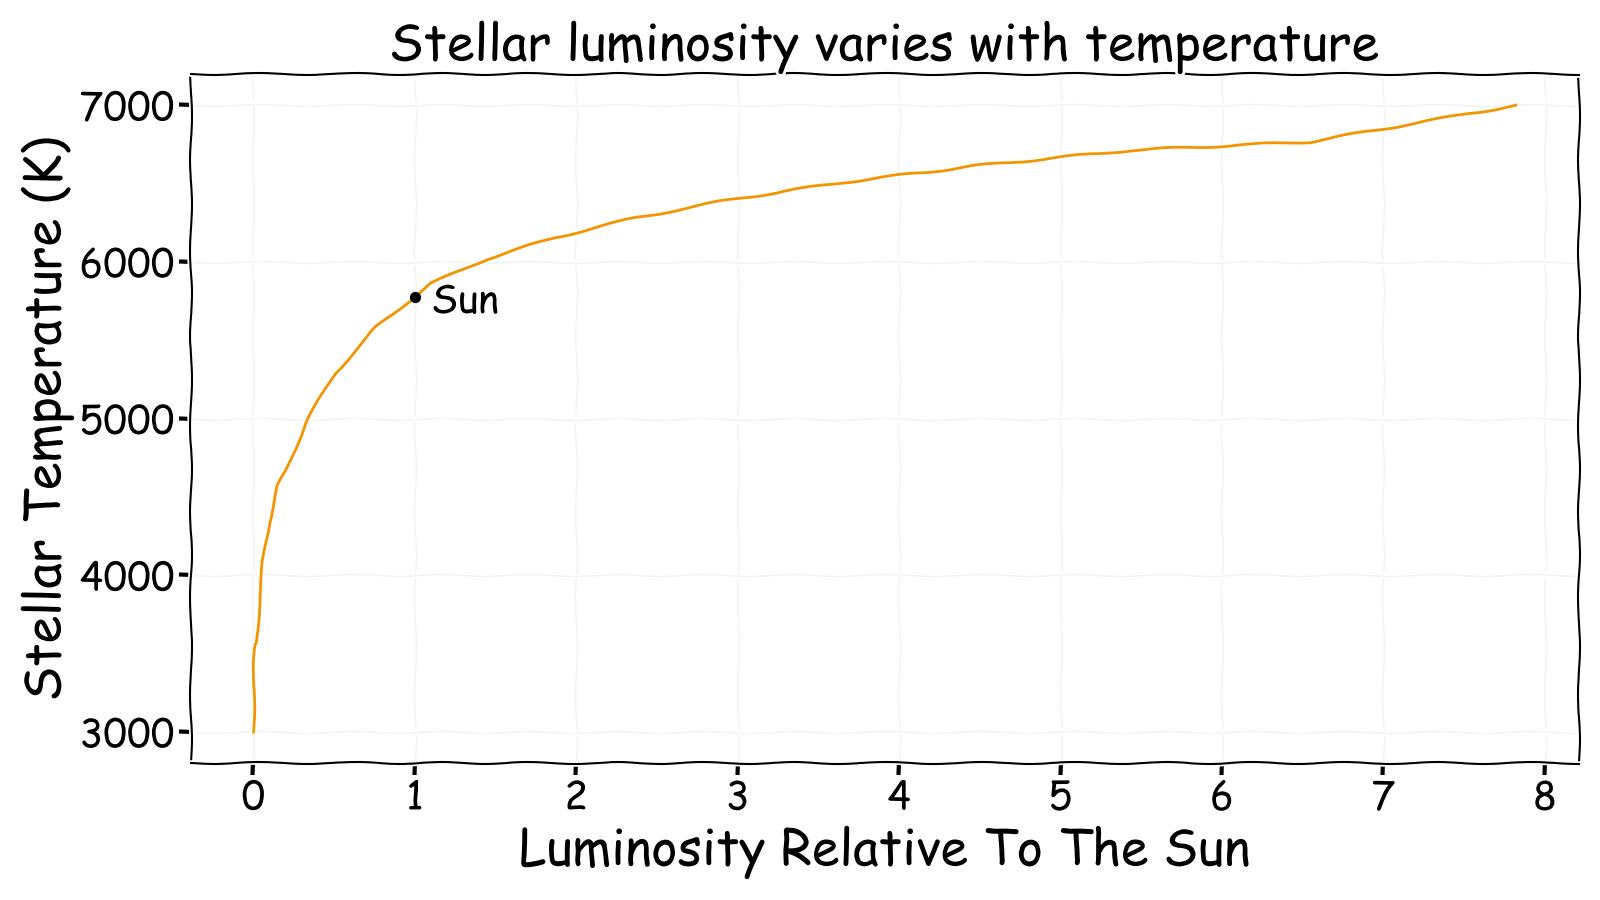 Luminosity varies with stellar temperature